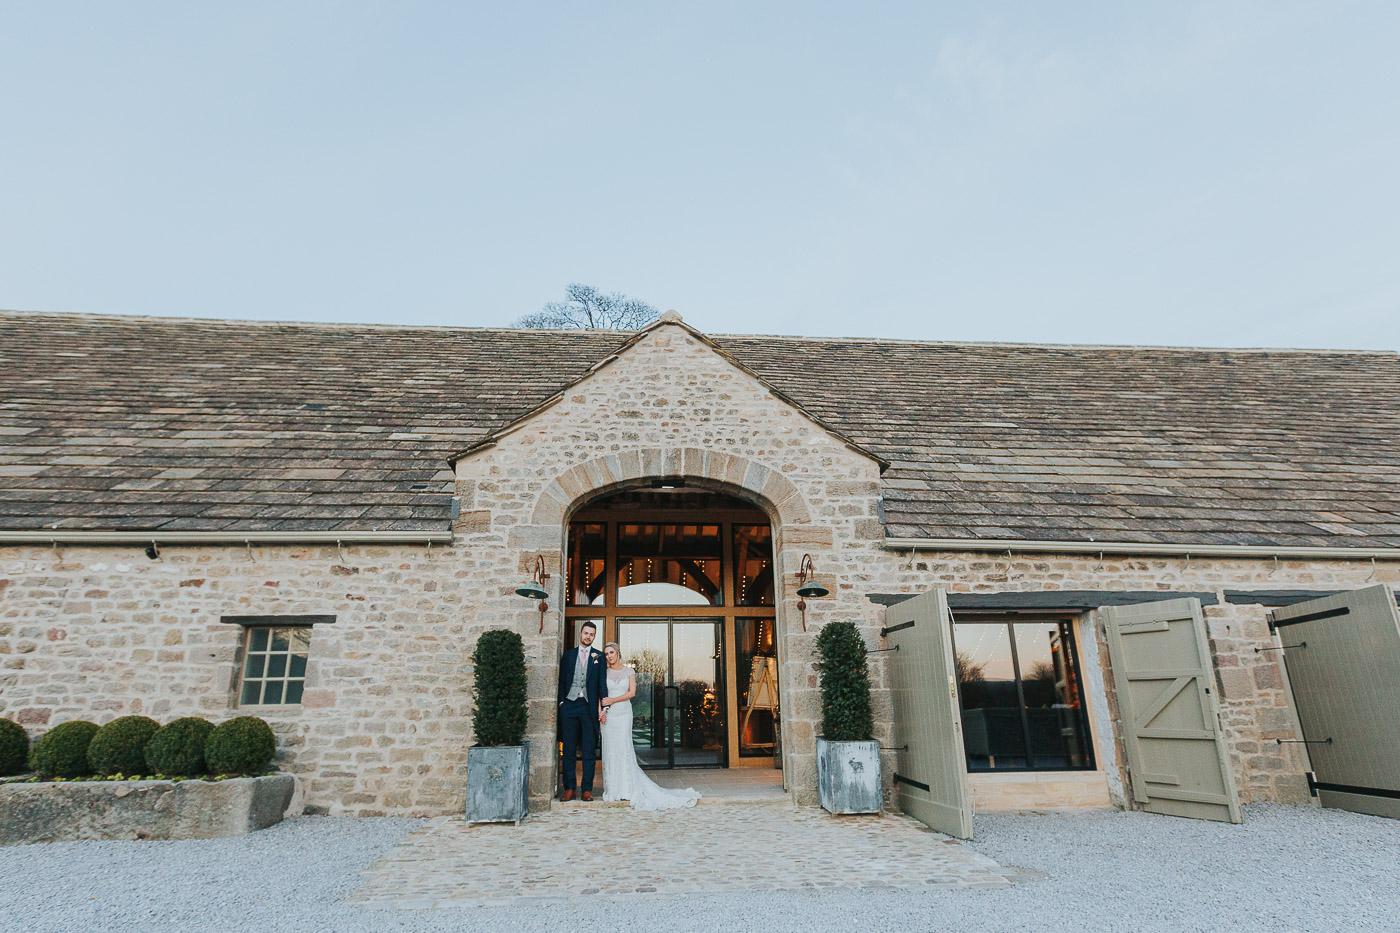 Tithe Barn - Laura Calderwood Photography - 29.3.19 - Mr & Mrs Lancaster290319-180.jpg